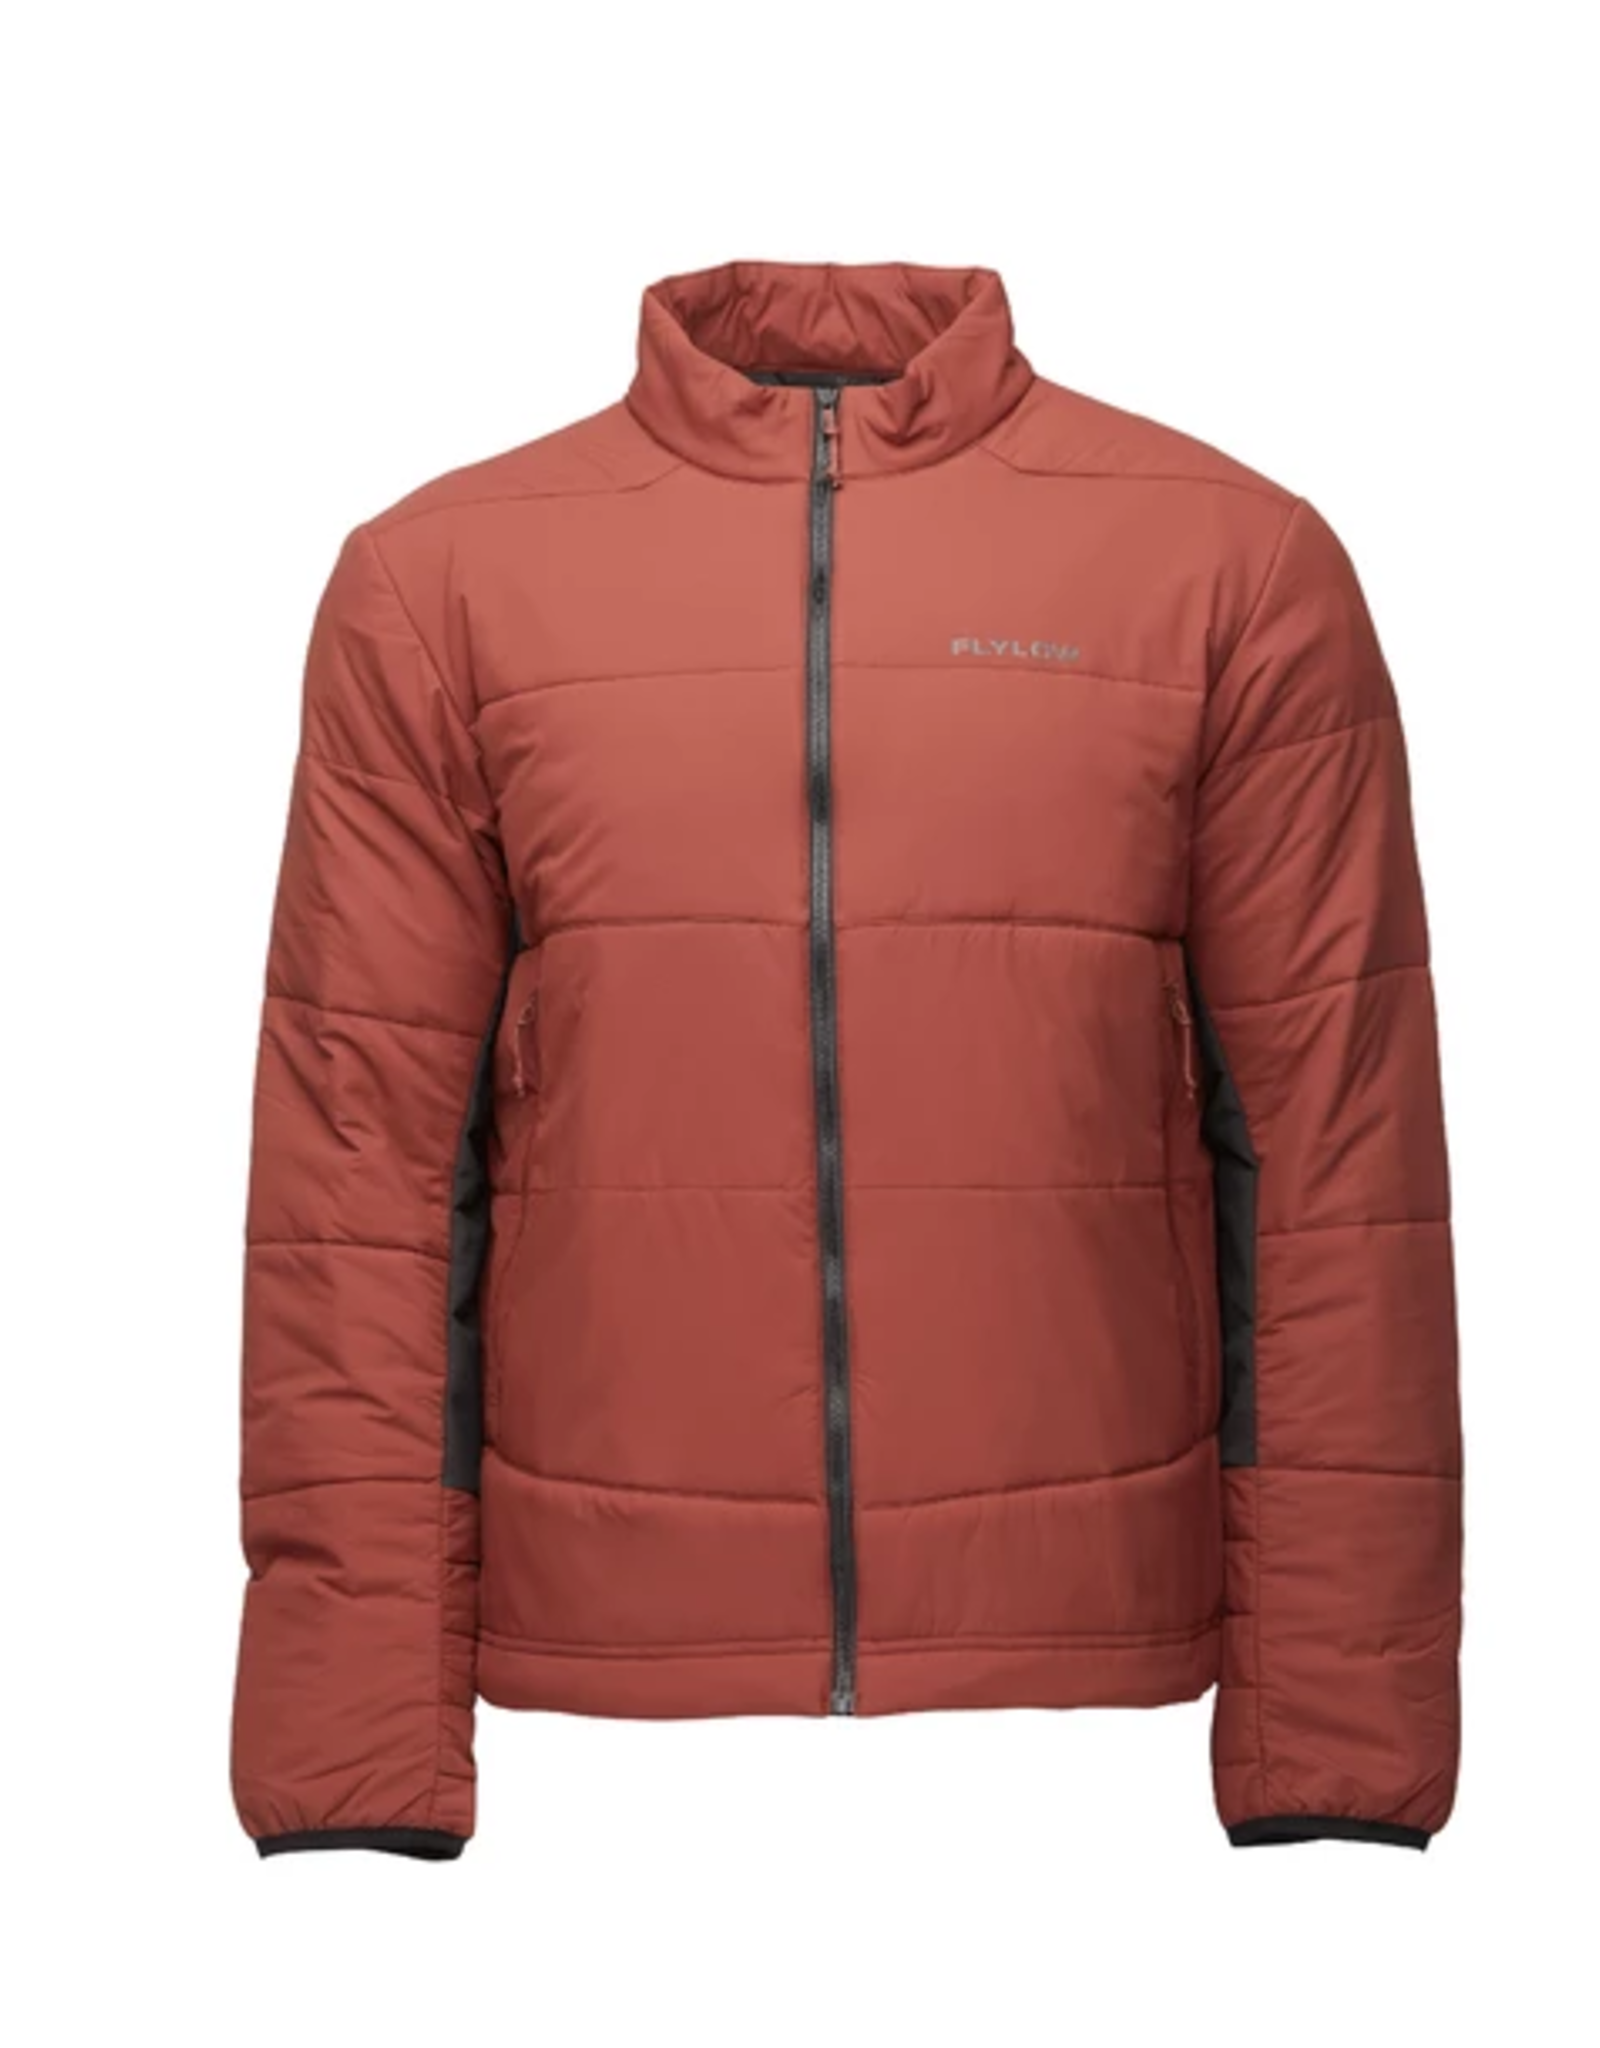 Flylow Max Jacket